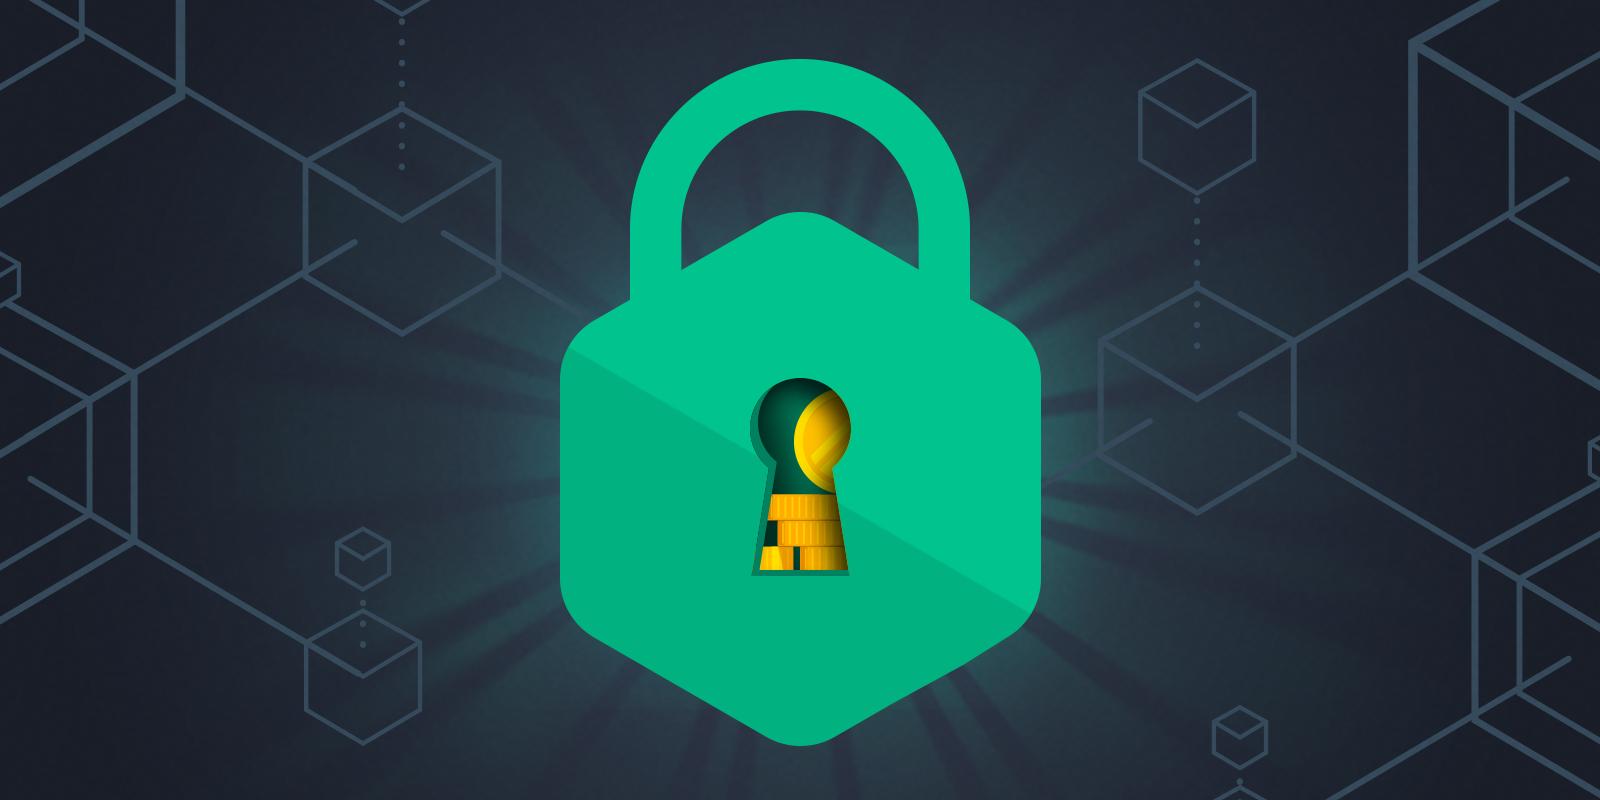 5ecdf20a94d2b6275c316083_benefits of staking crypto swissborg-website-main.png